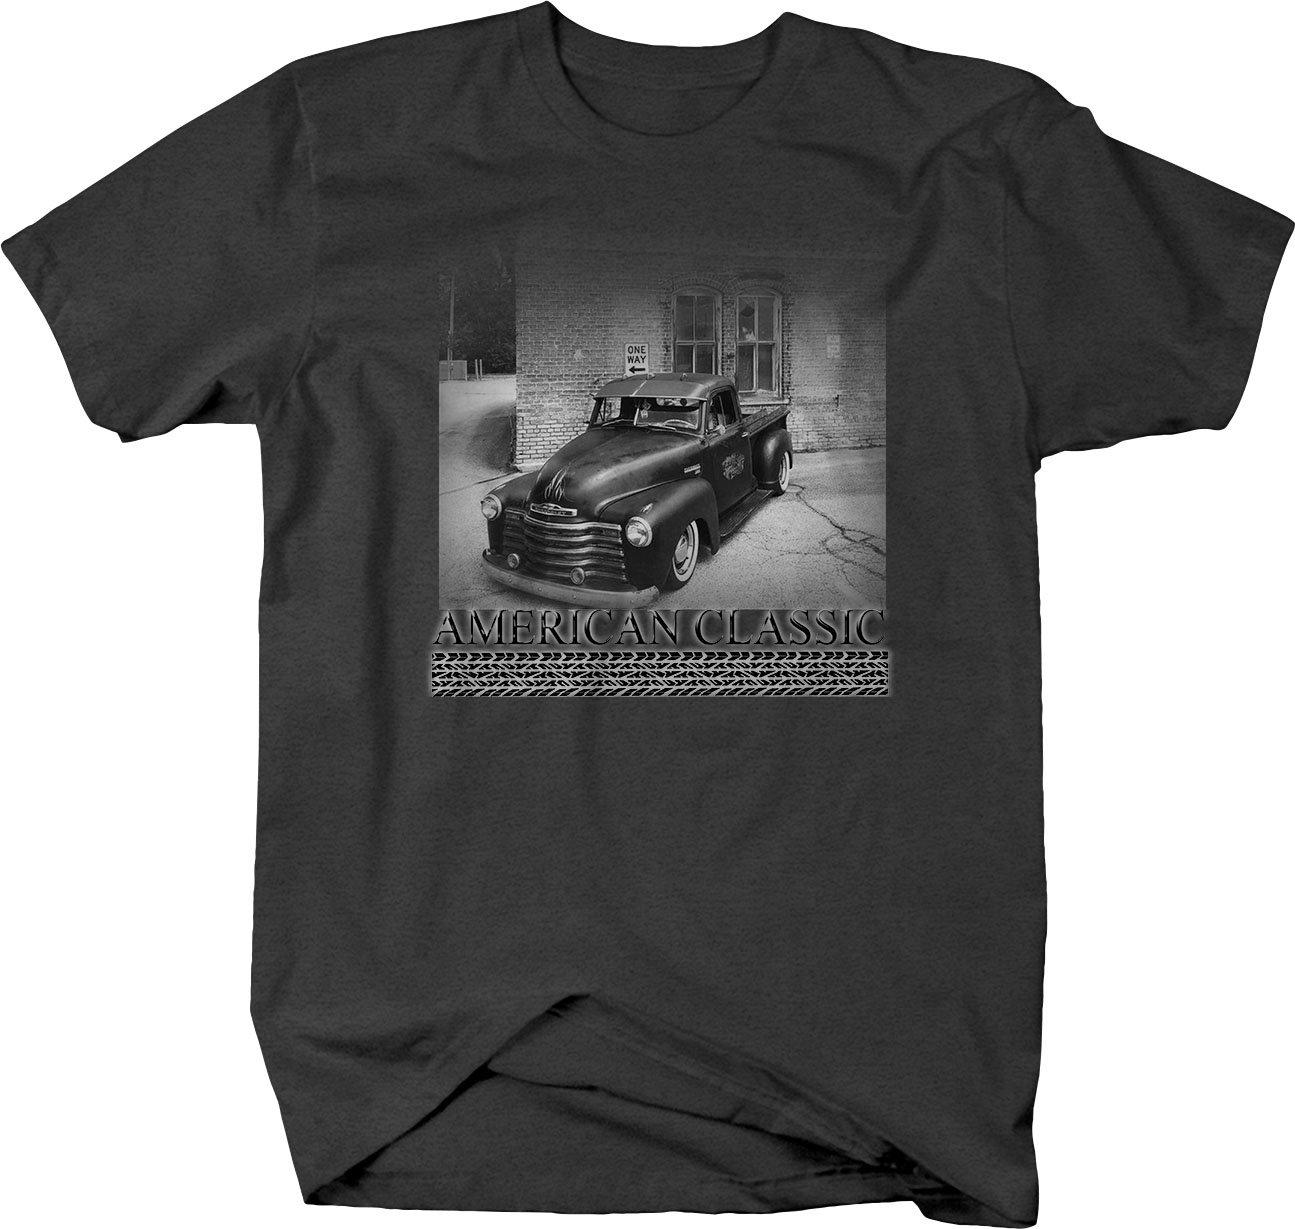 Retro American Classic 50s Patina Chevy Hotrod Pickup Truck Tshirt